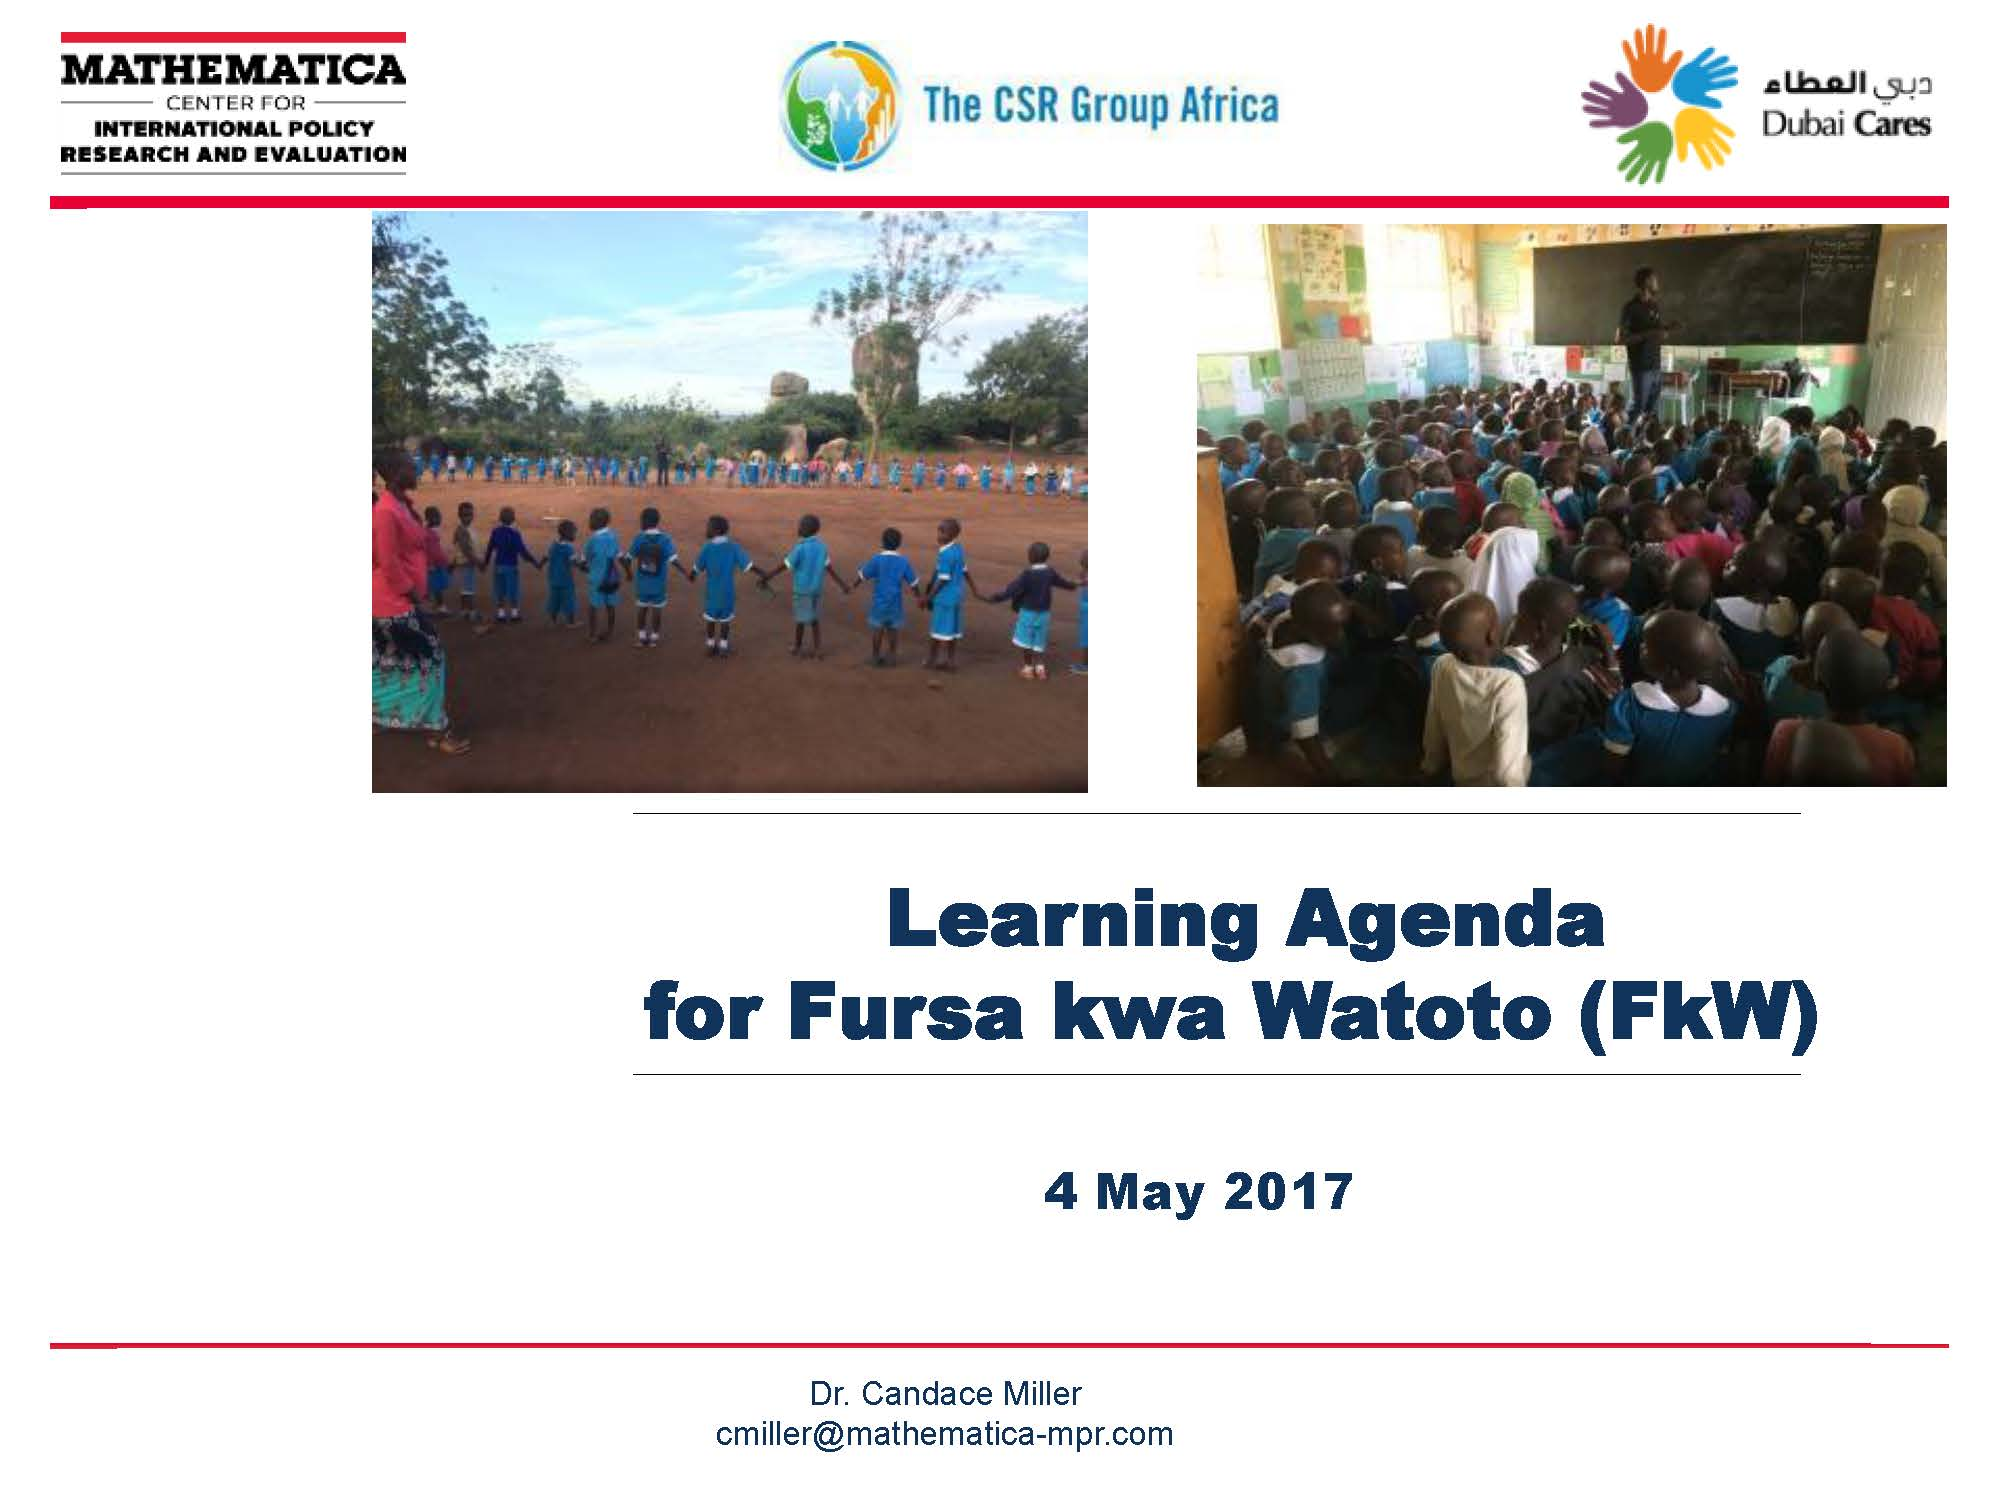 Presentation 6 - Mathematica Learning Agenda (proposed)